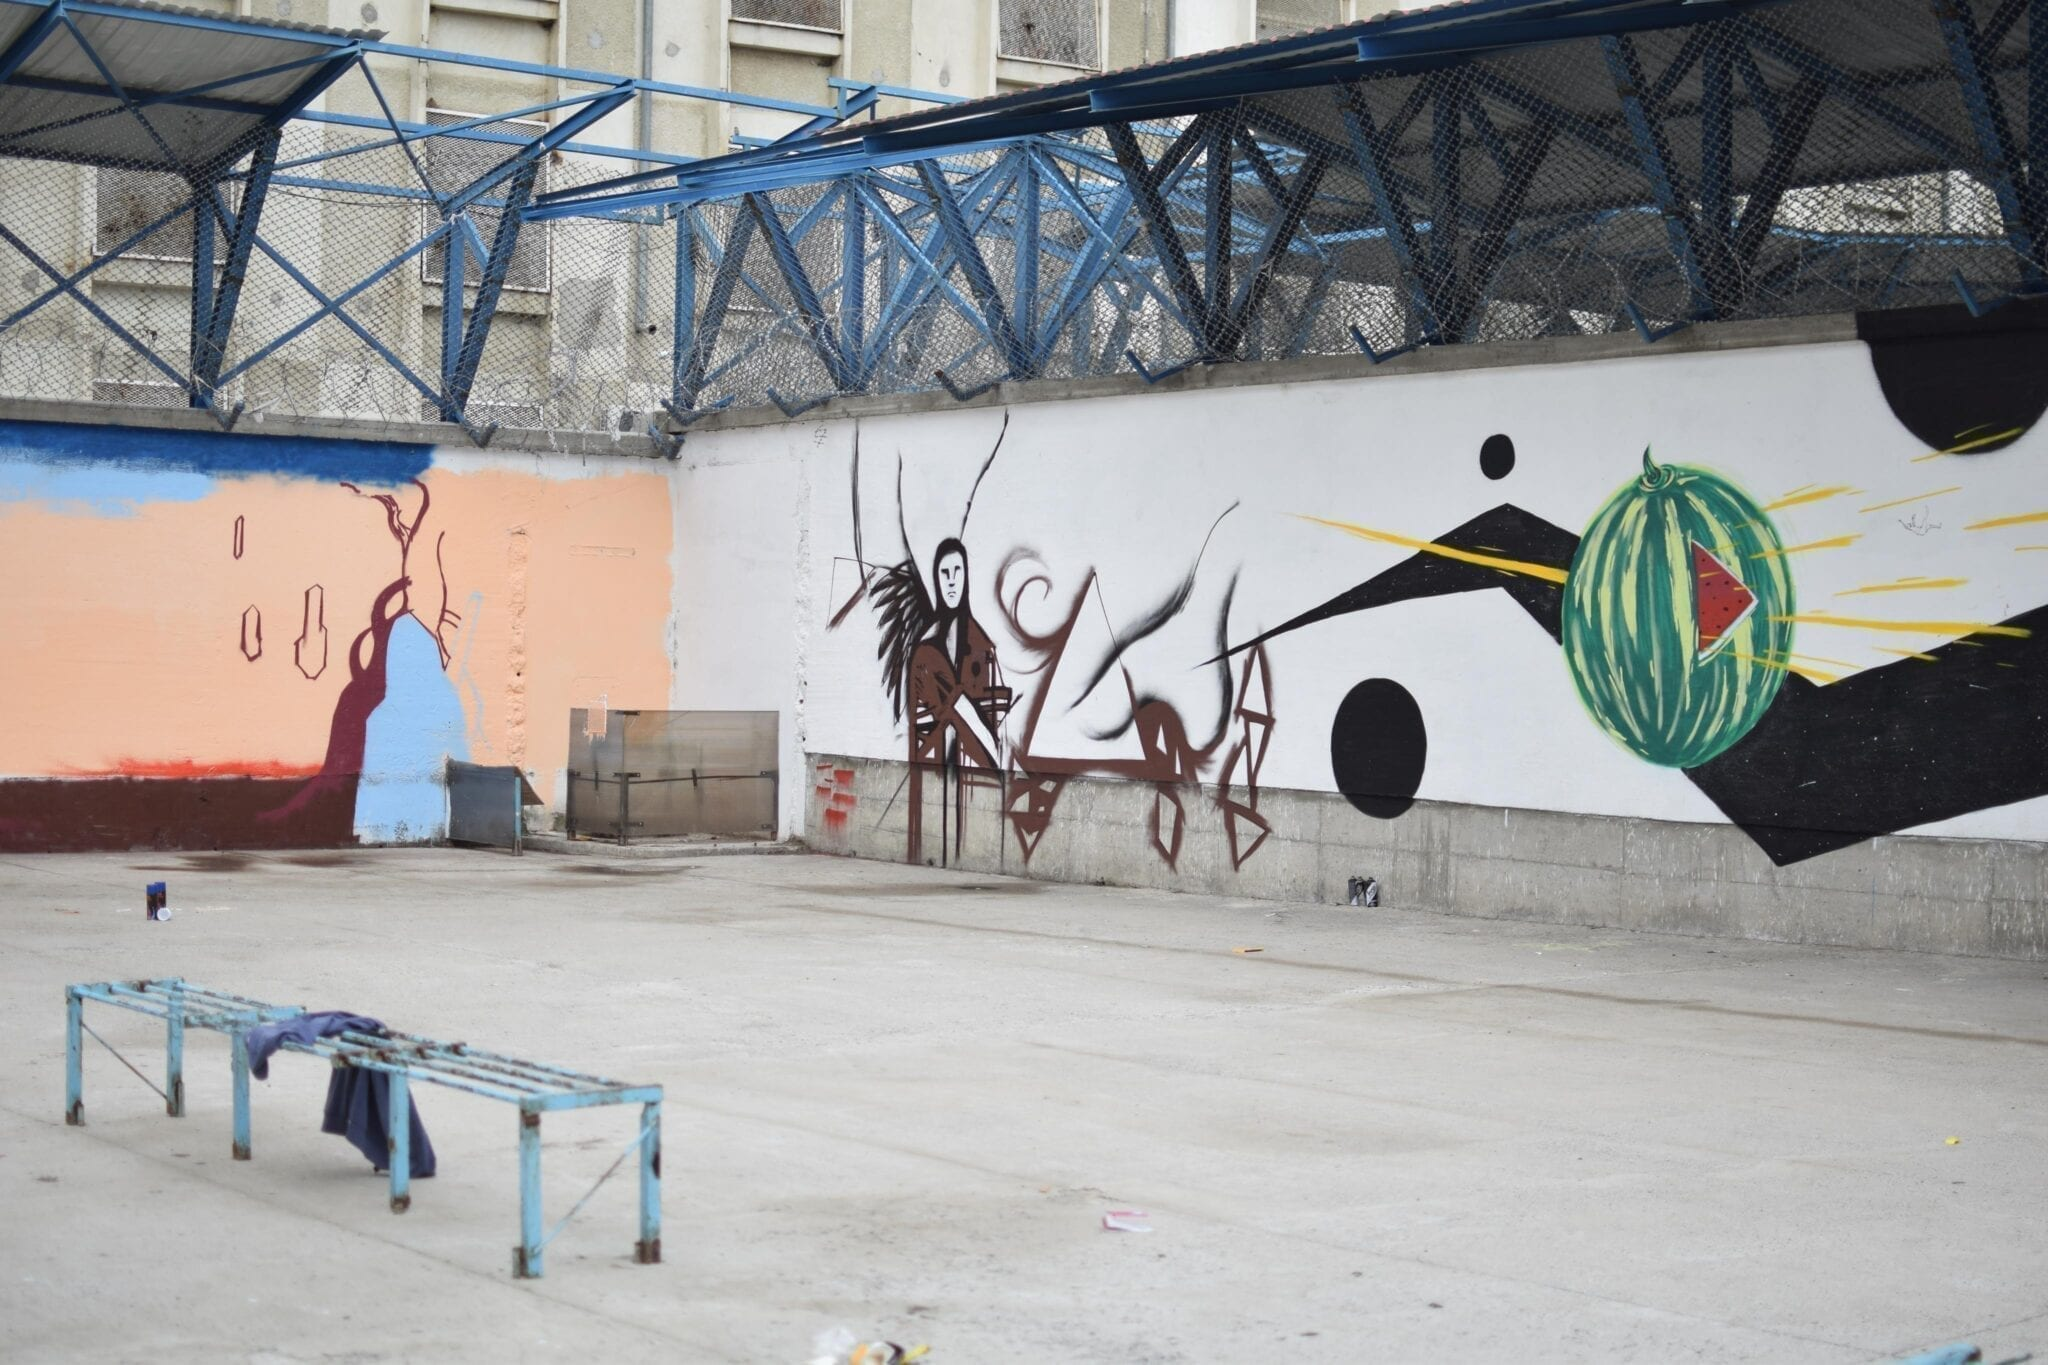 Street Delivery penitenciarul Iași 2018 Street Delivery penitenciarul Iași 2018 Un-hidden street art in Romania book art files